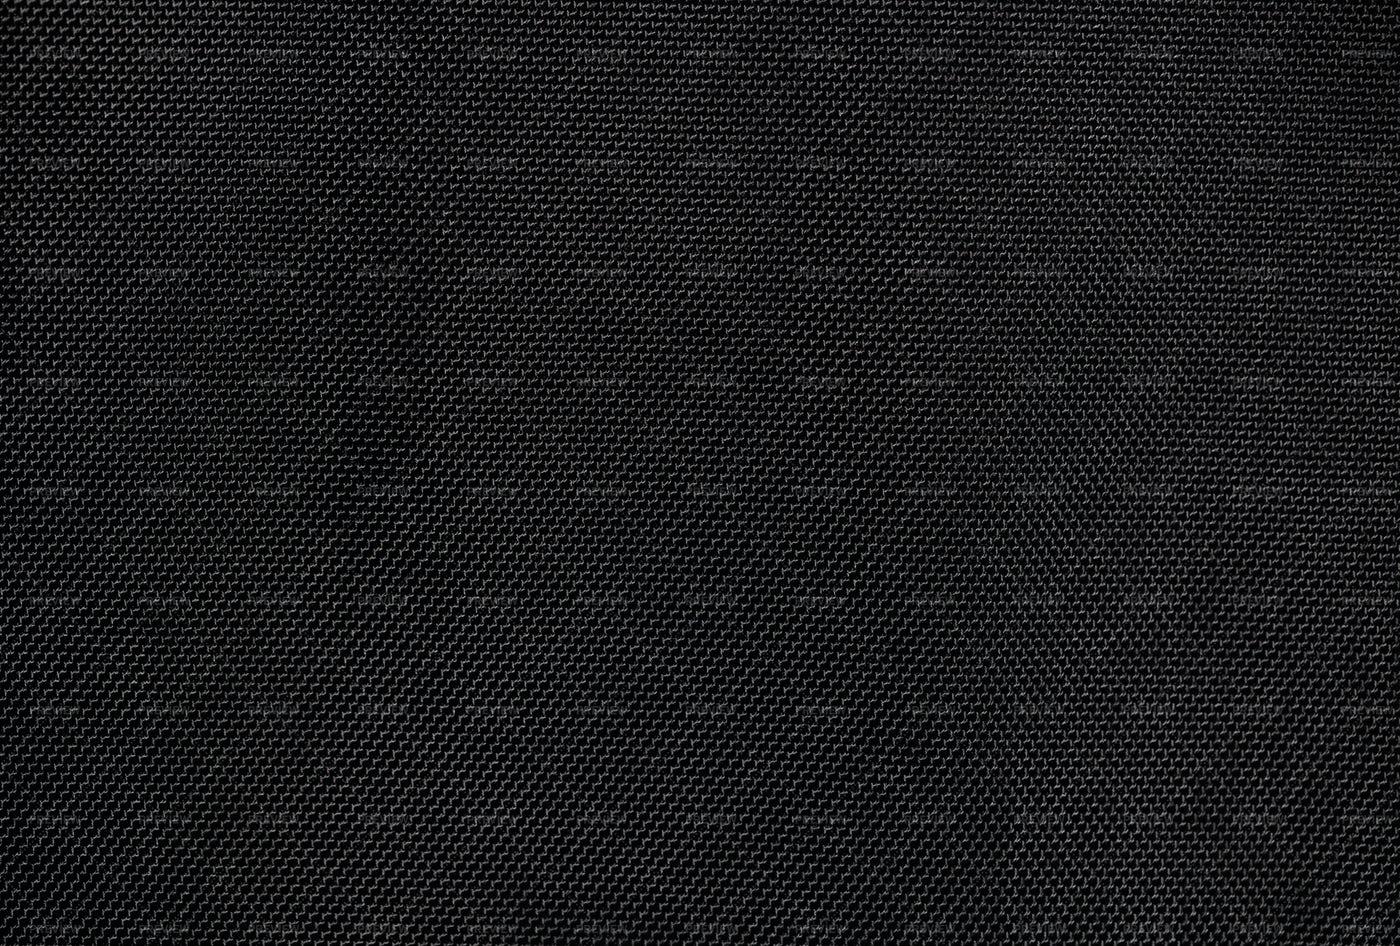 Black Textured Background: Stock Photos